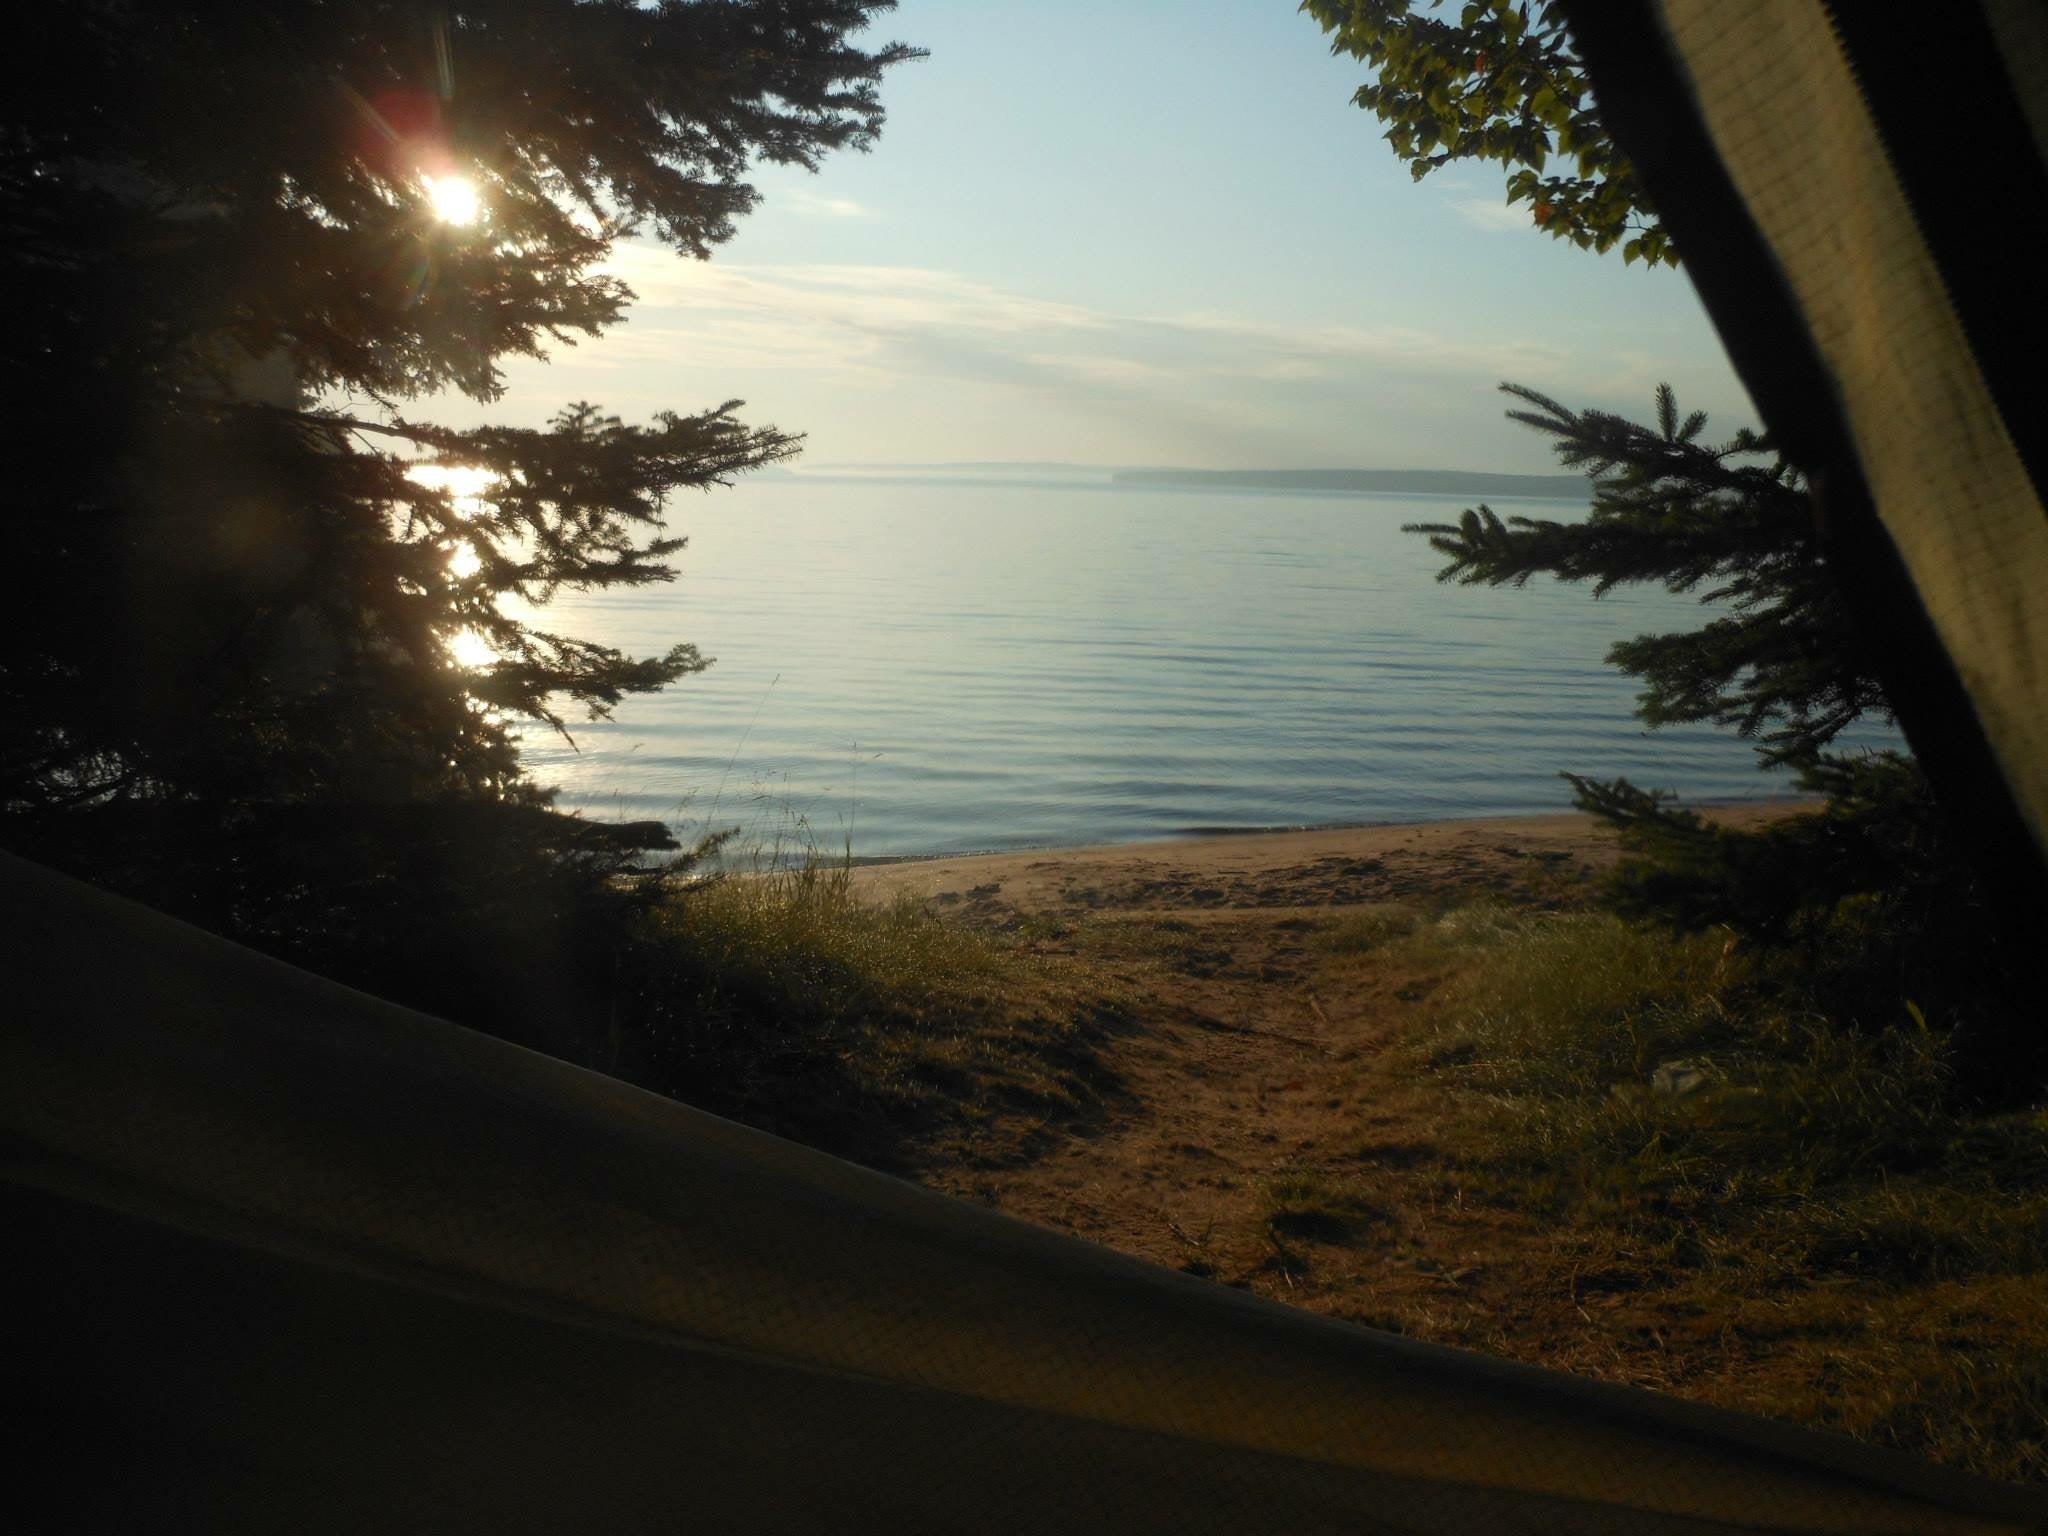 sun peeks through lakeside trees in wisconsin